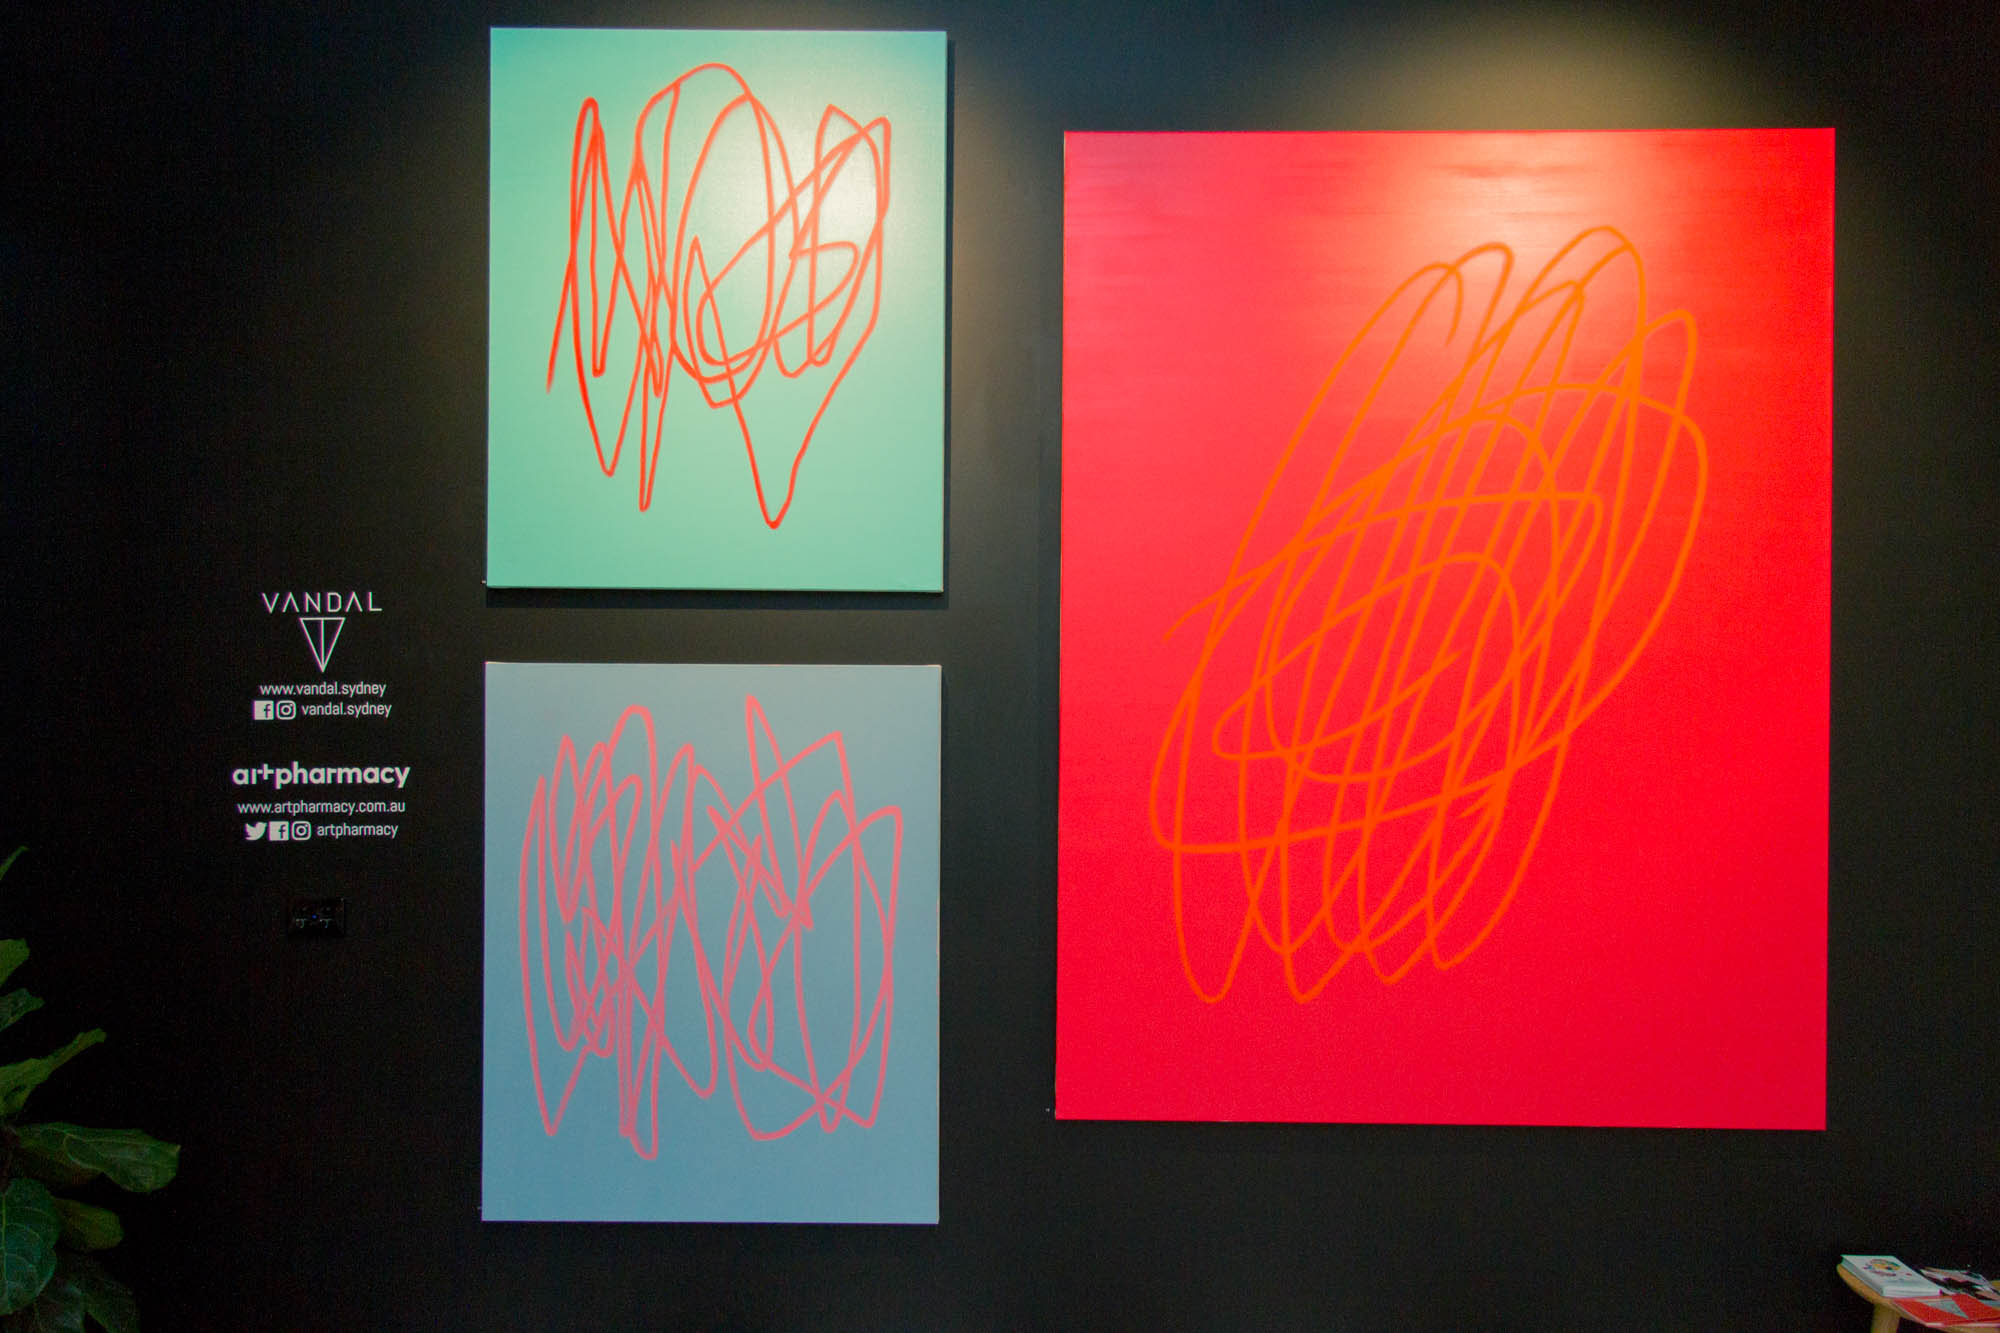 Art Pharamacy_Vandal Gallery_Pressure Sensitive_ Joel Dickens_7D_Vandal Pressure Sensitive 010.JPG